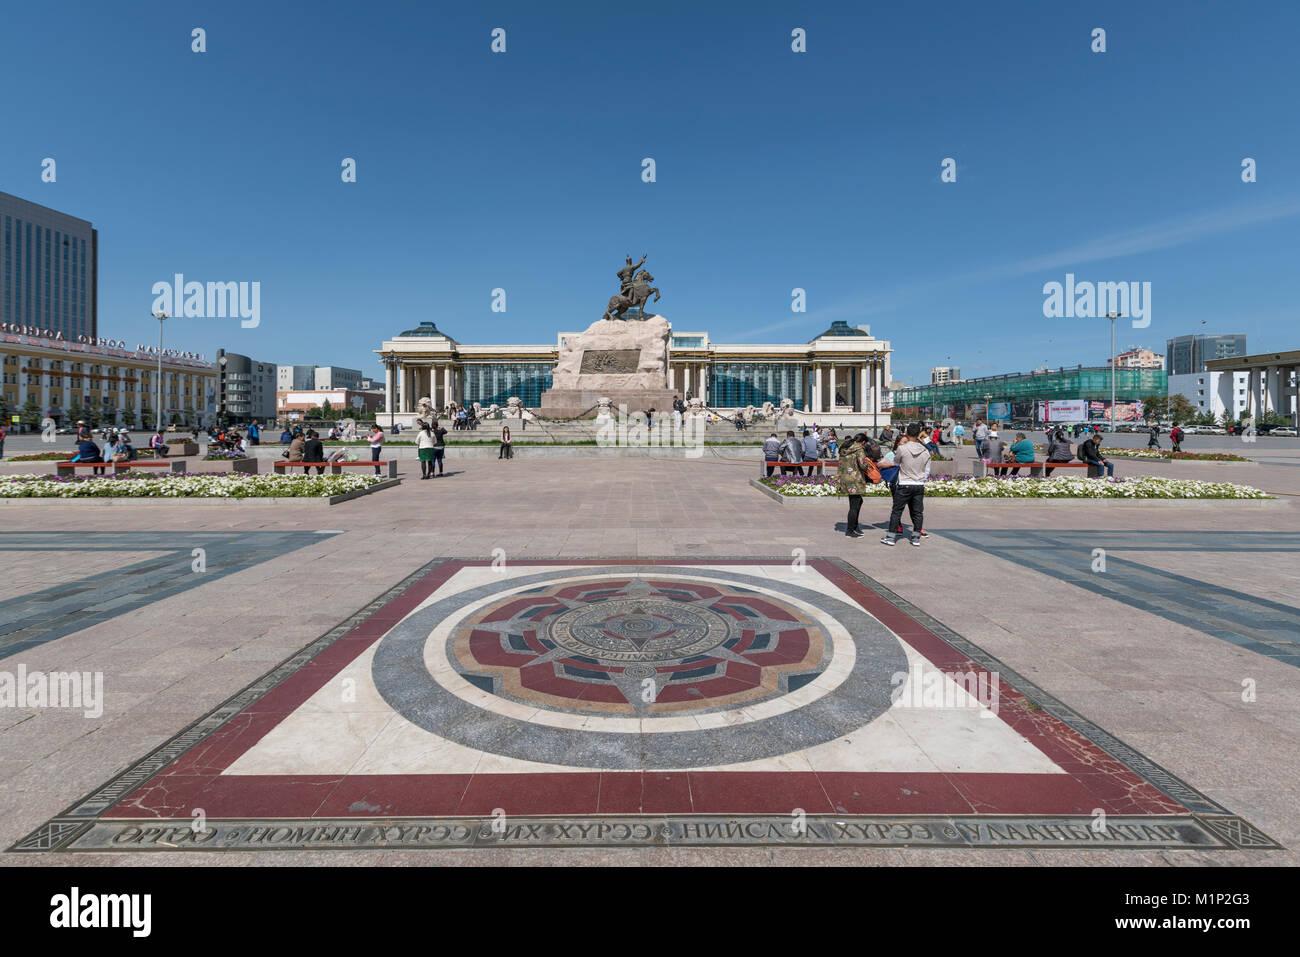 Touristen in Sukhbaatar Platz mit damdin Sukhbaatar Statue, Ulan Bator, Mongolei, Zentralasien, Asien Stockbild